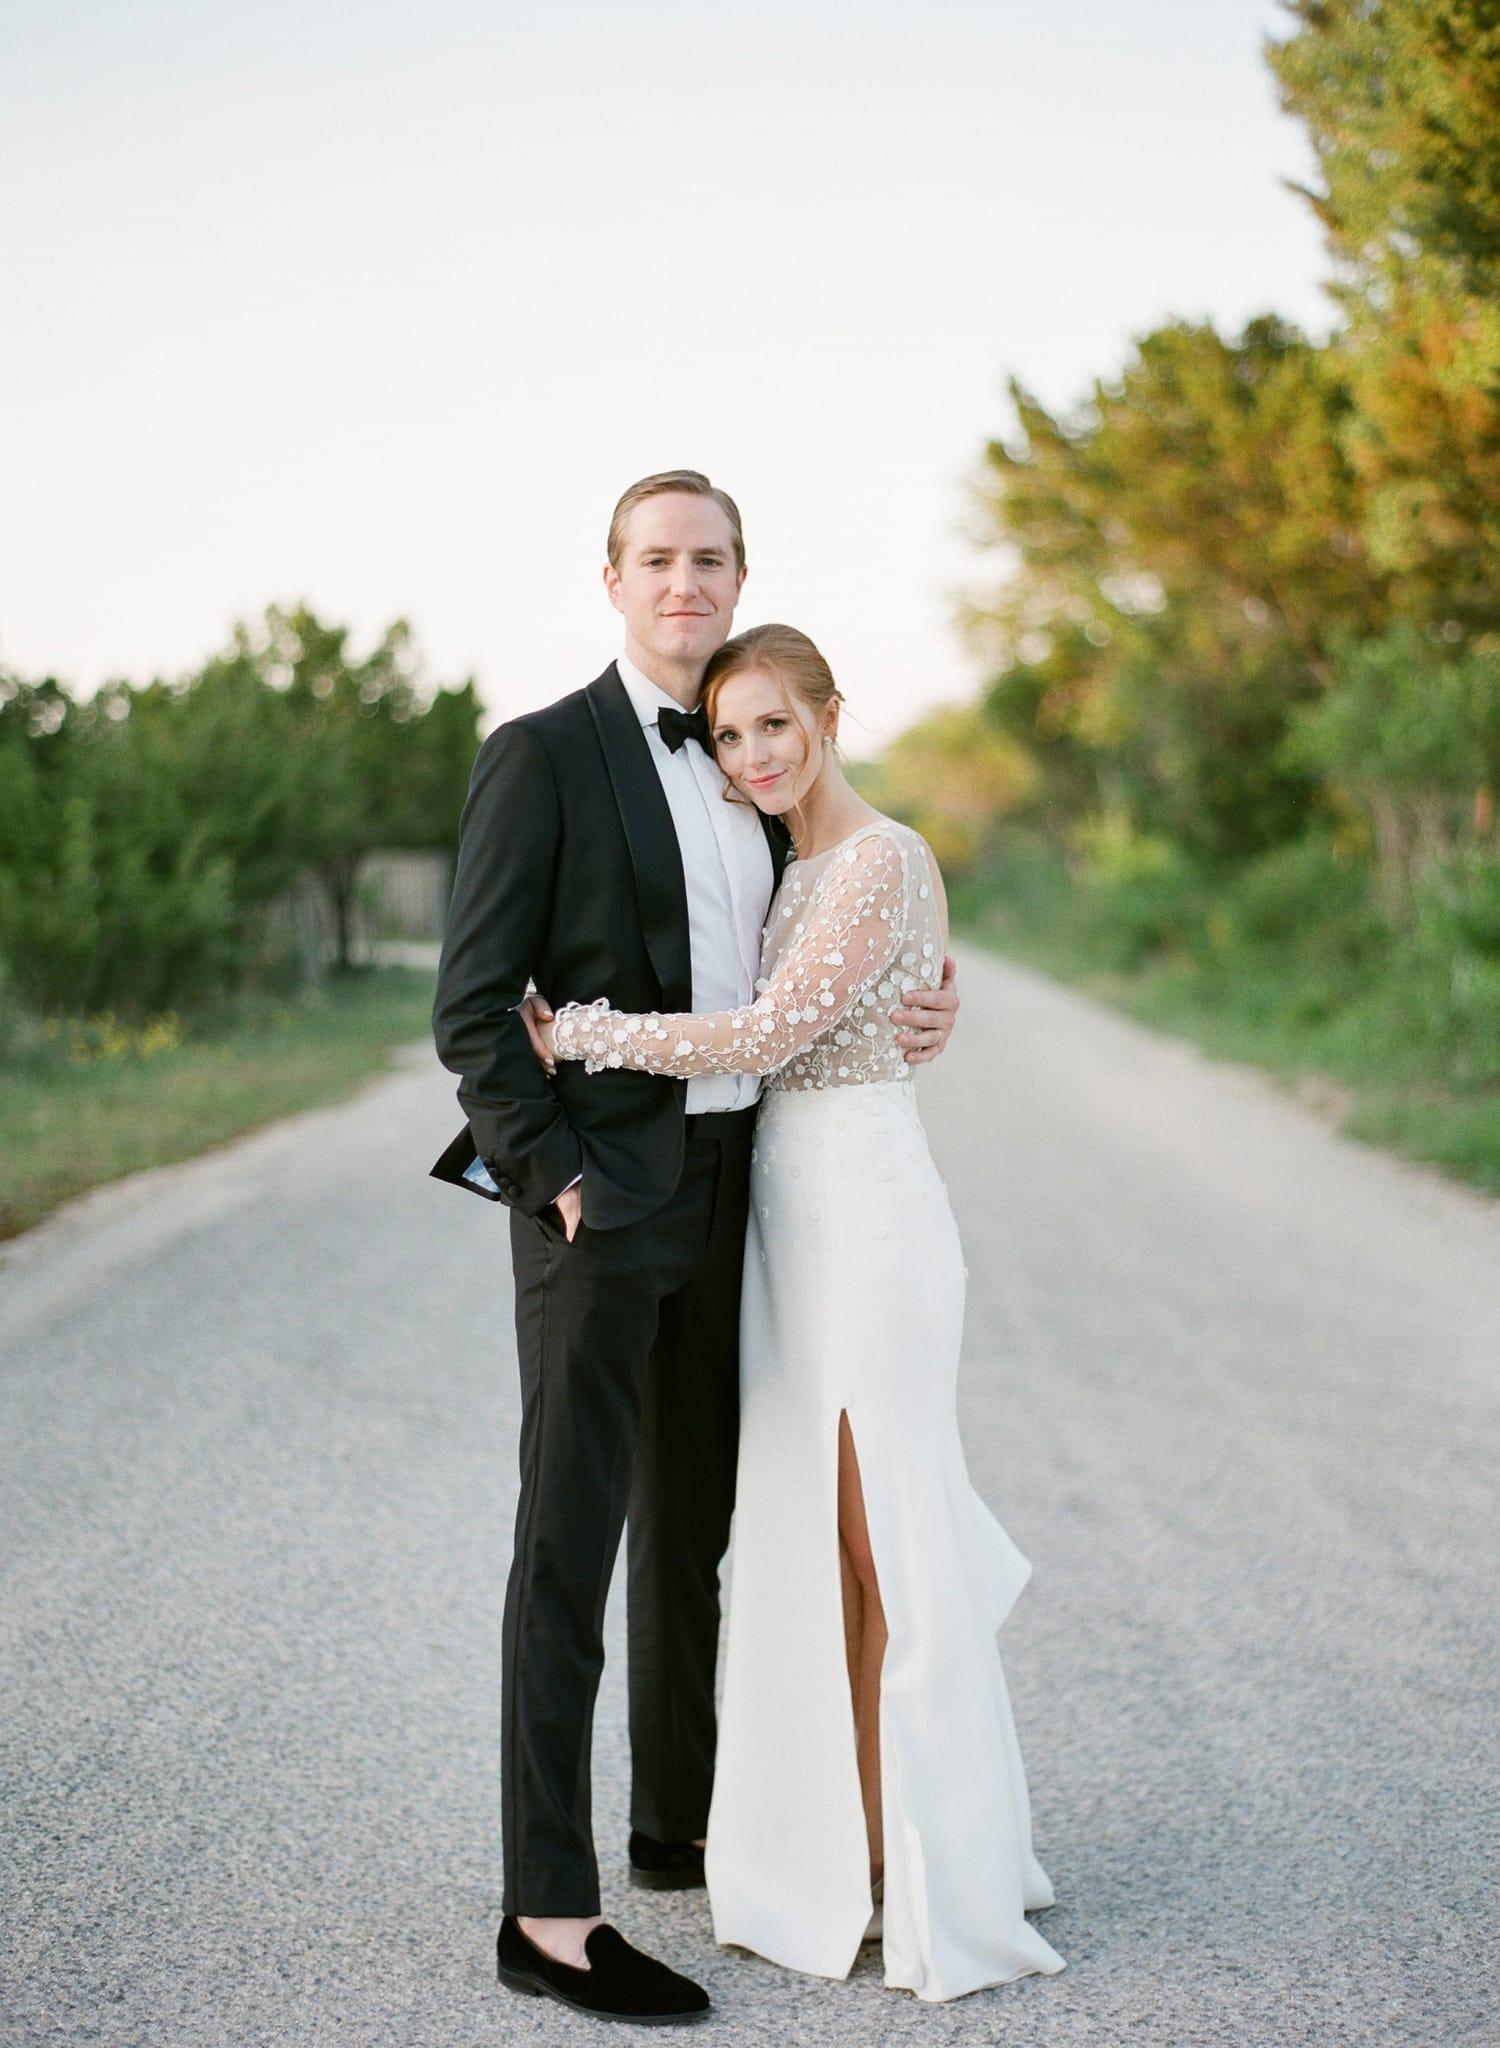 prospect-house-wedding-21.jpg